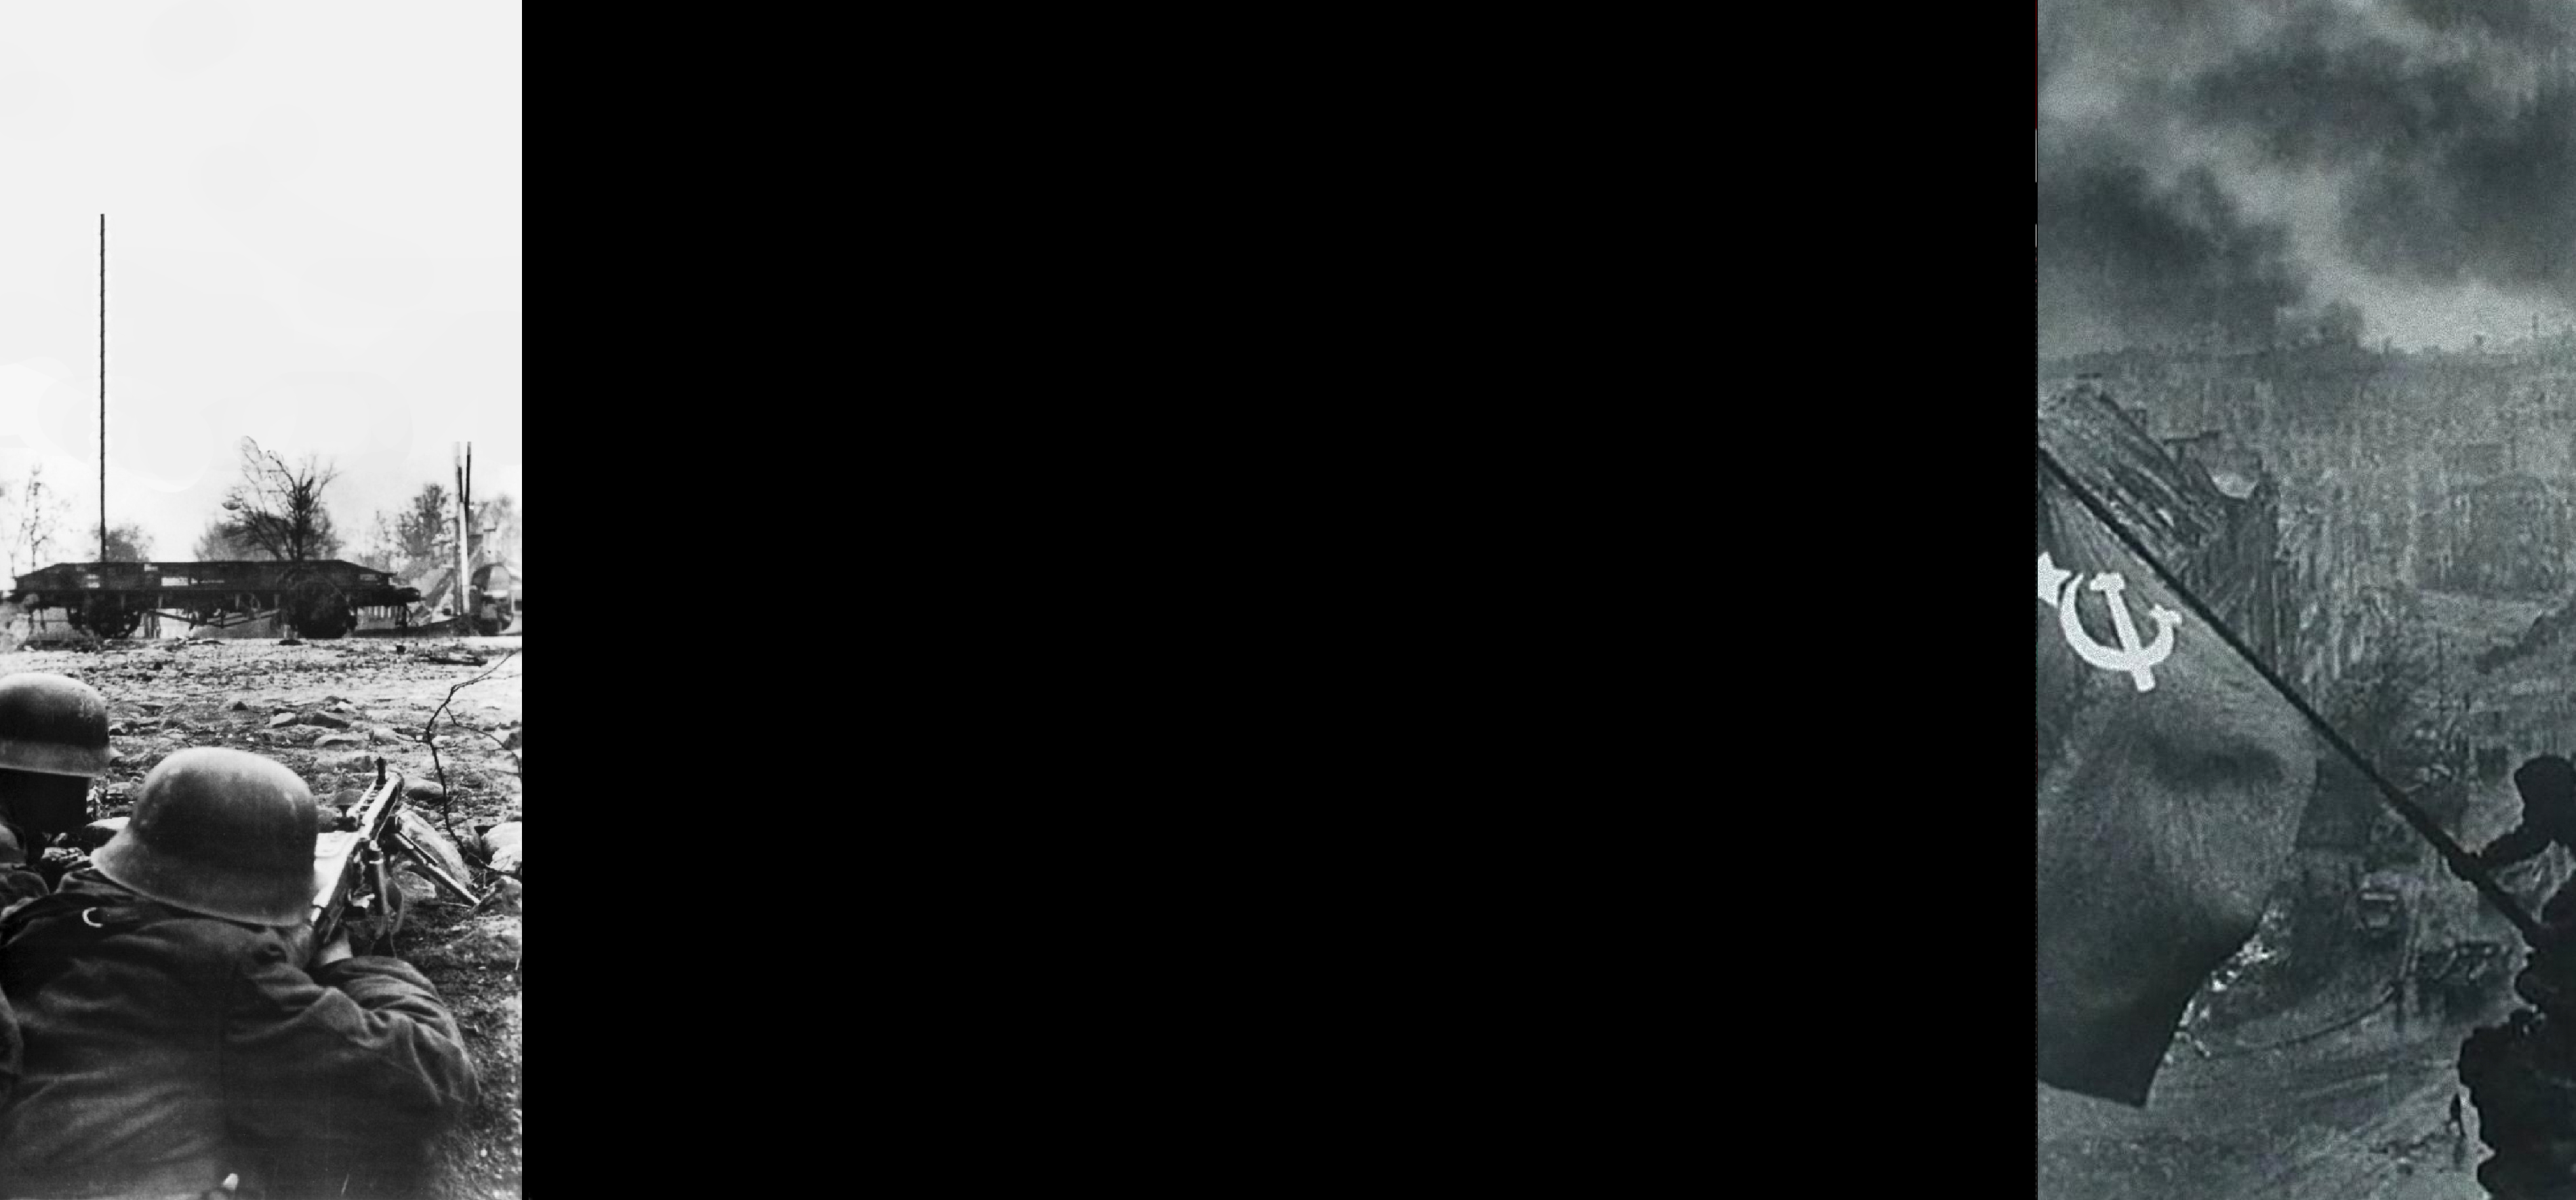 EPICBROFIST